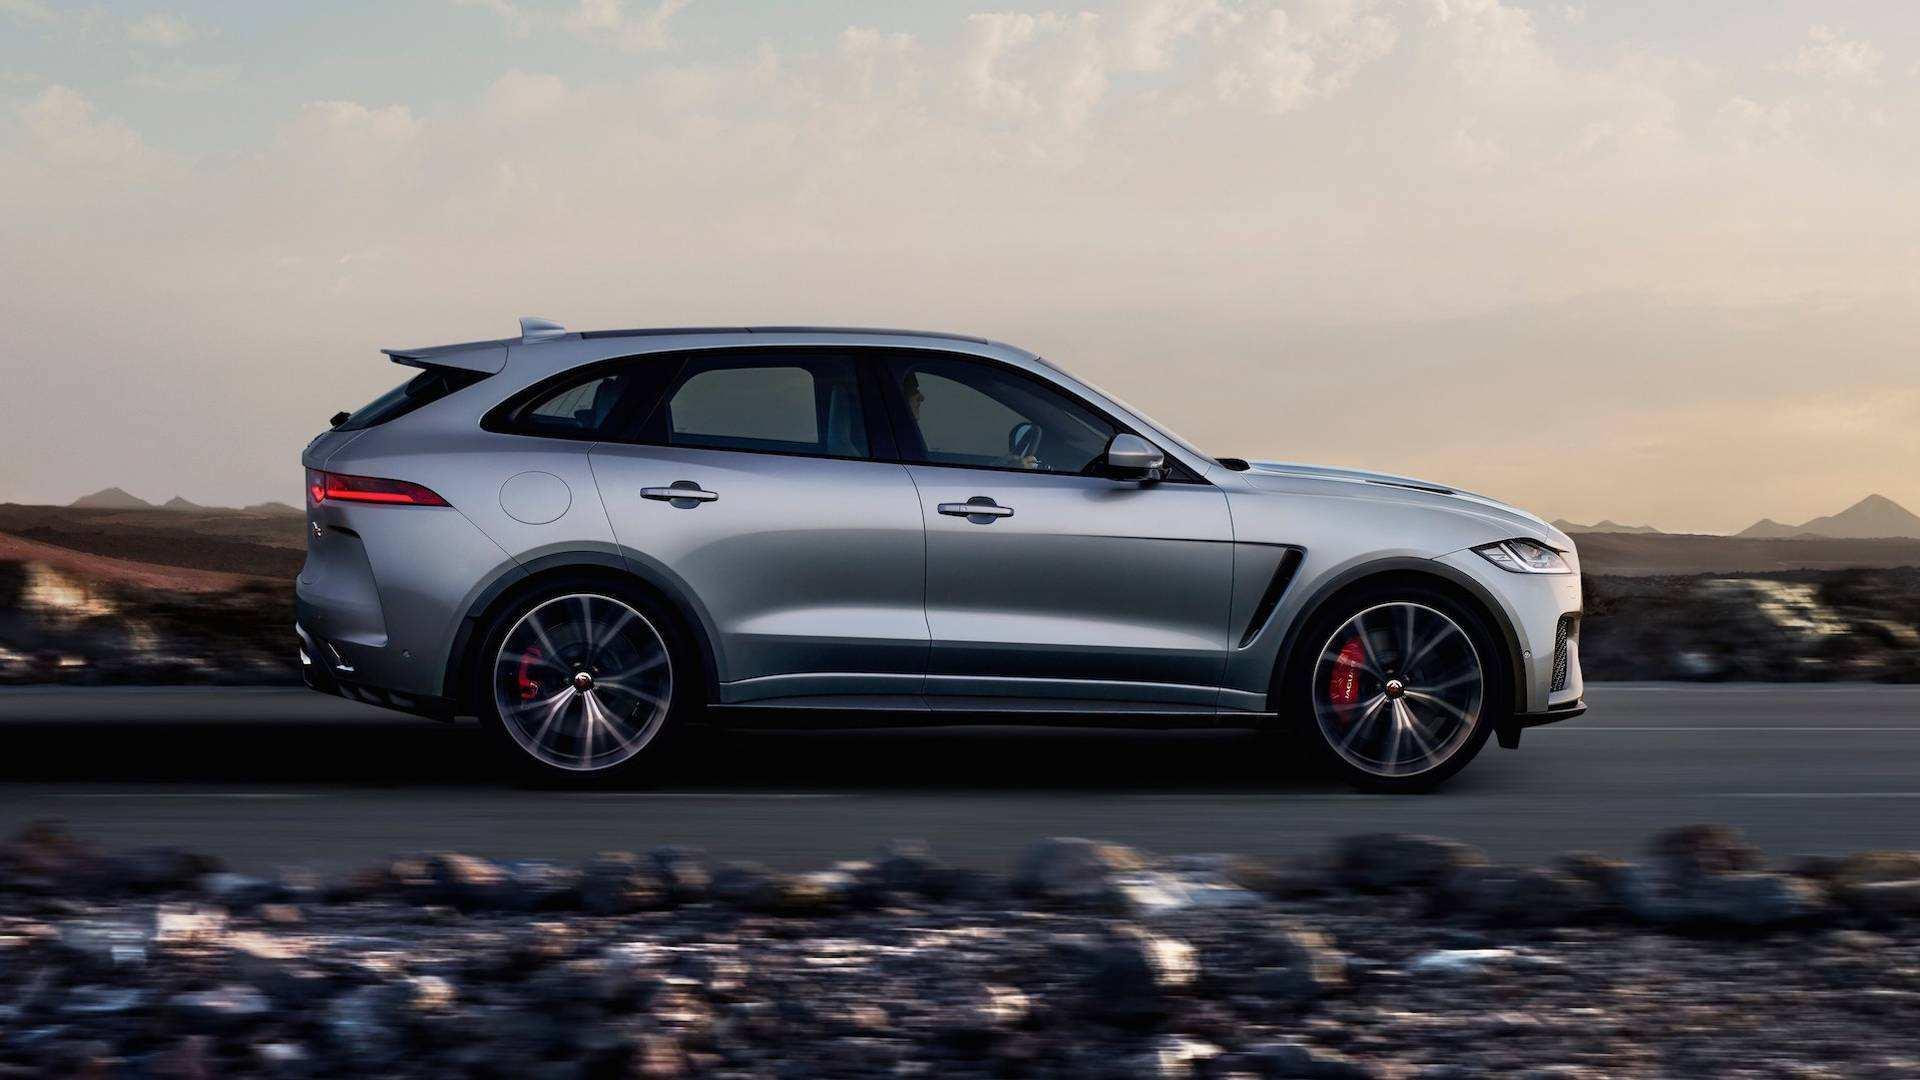 96 Gallery of New Jaguar F Pace 2020 Spy Shoot for New Jaguar F Pace 2020